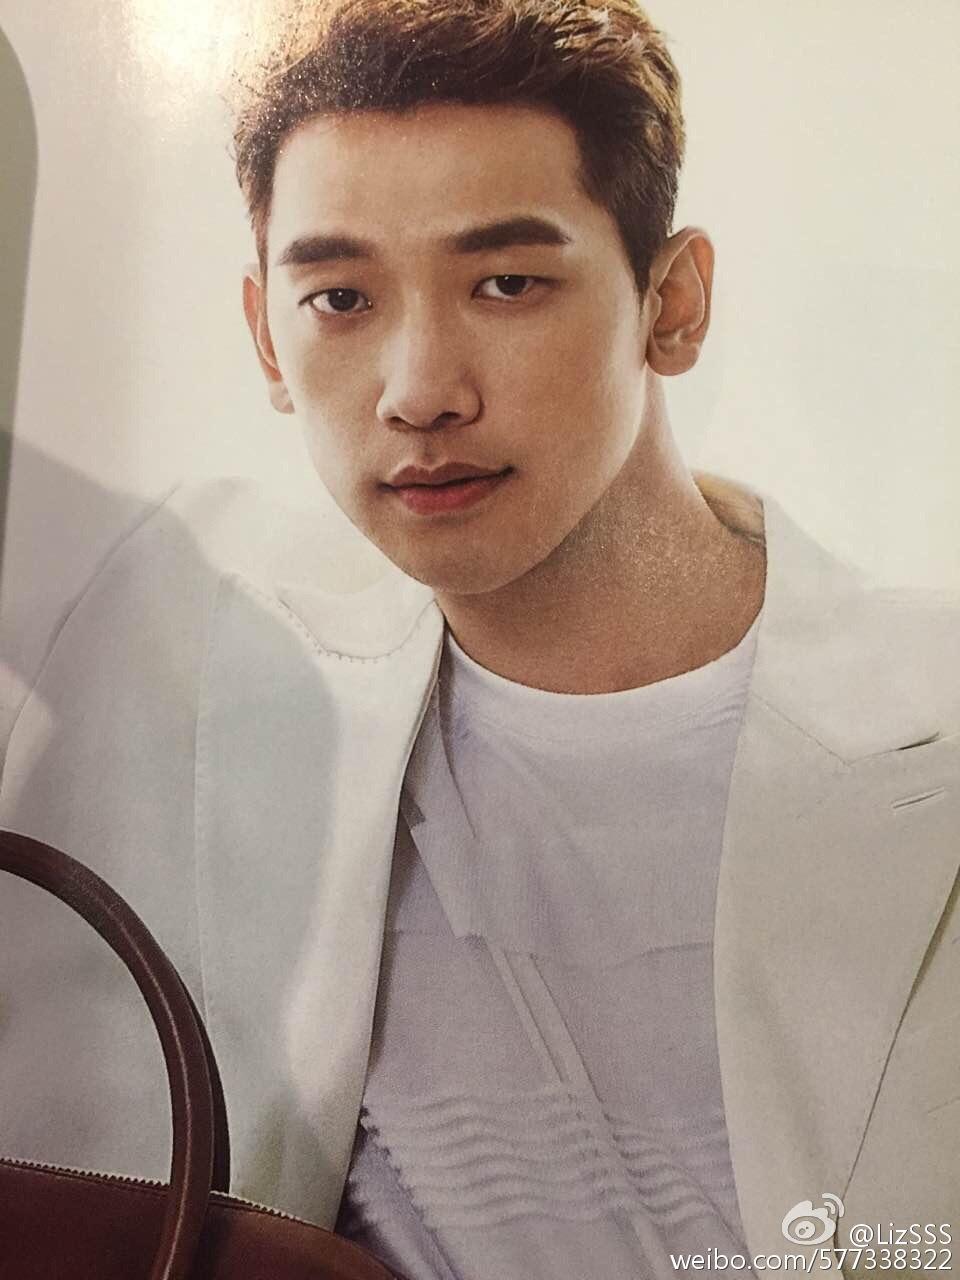 Rain 男人风尚 Leon Magazine _c0047605_7573383.jpg